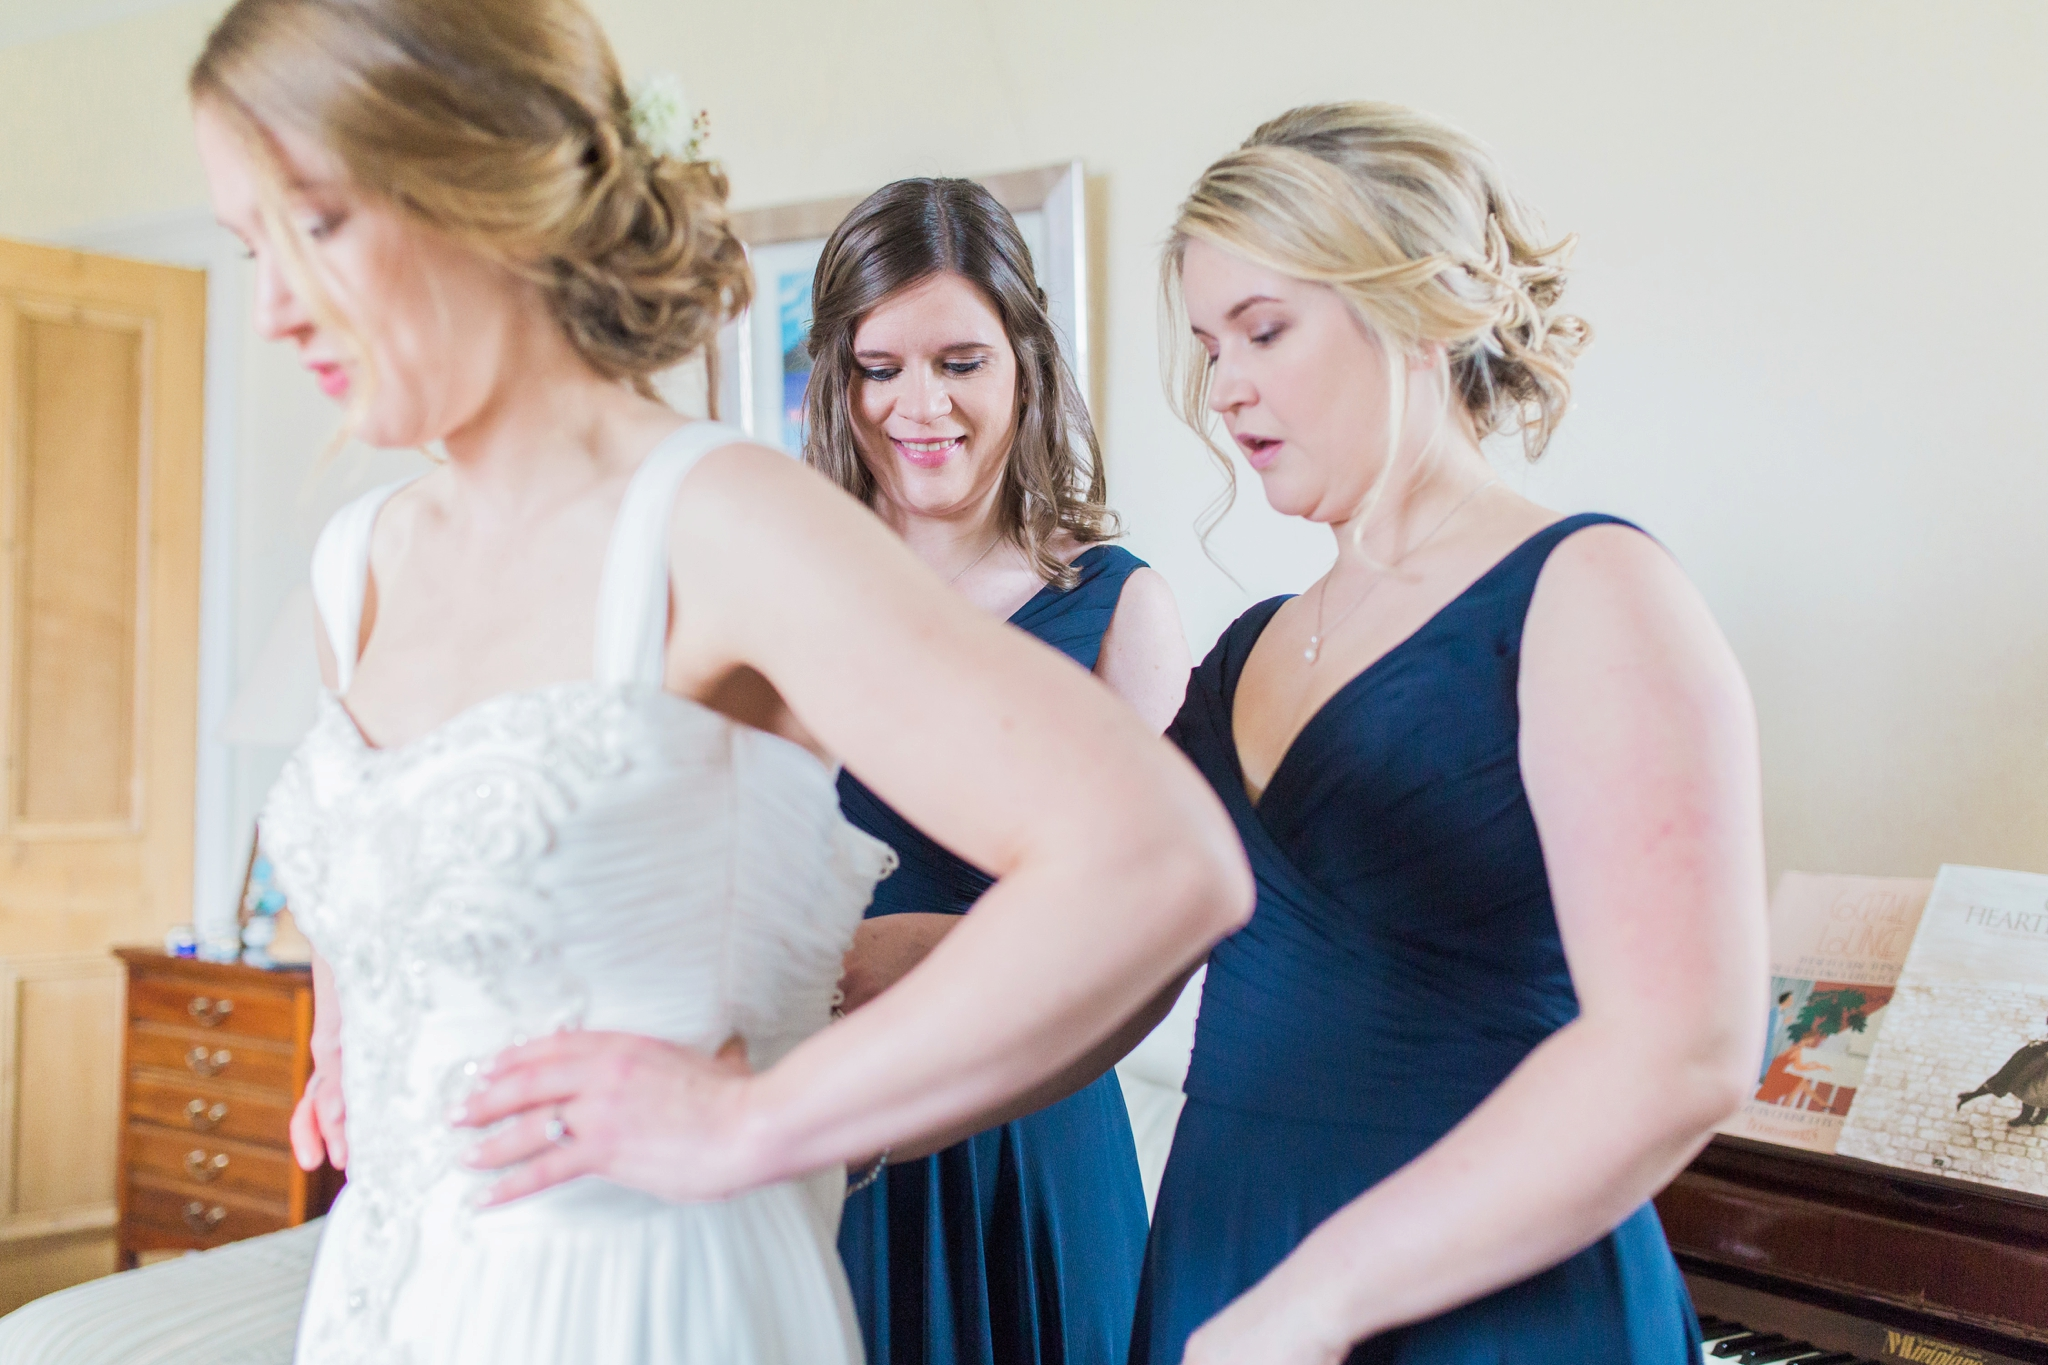 Suzanne_li_photography_kirknewton_wedding_0017.jpg